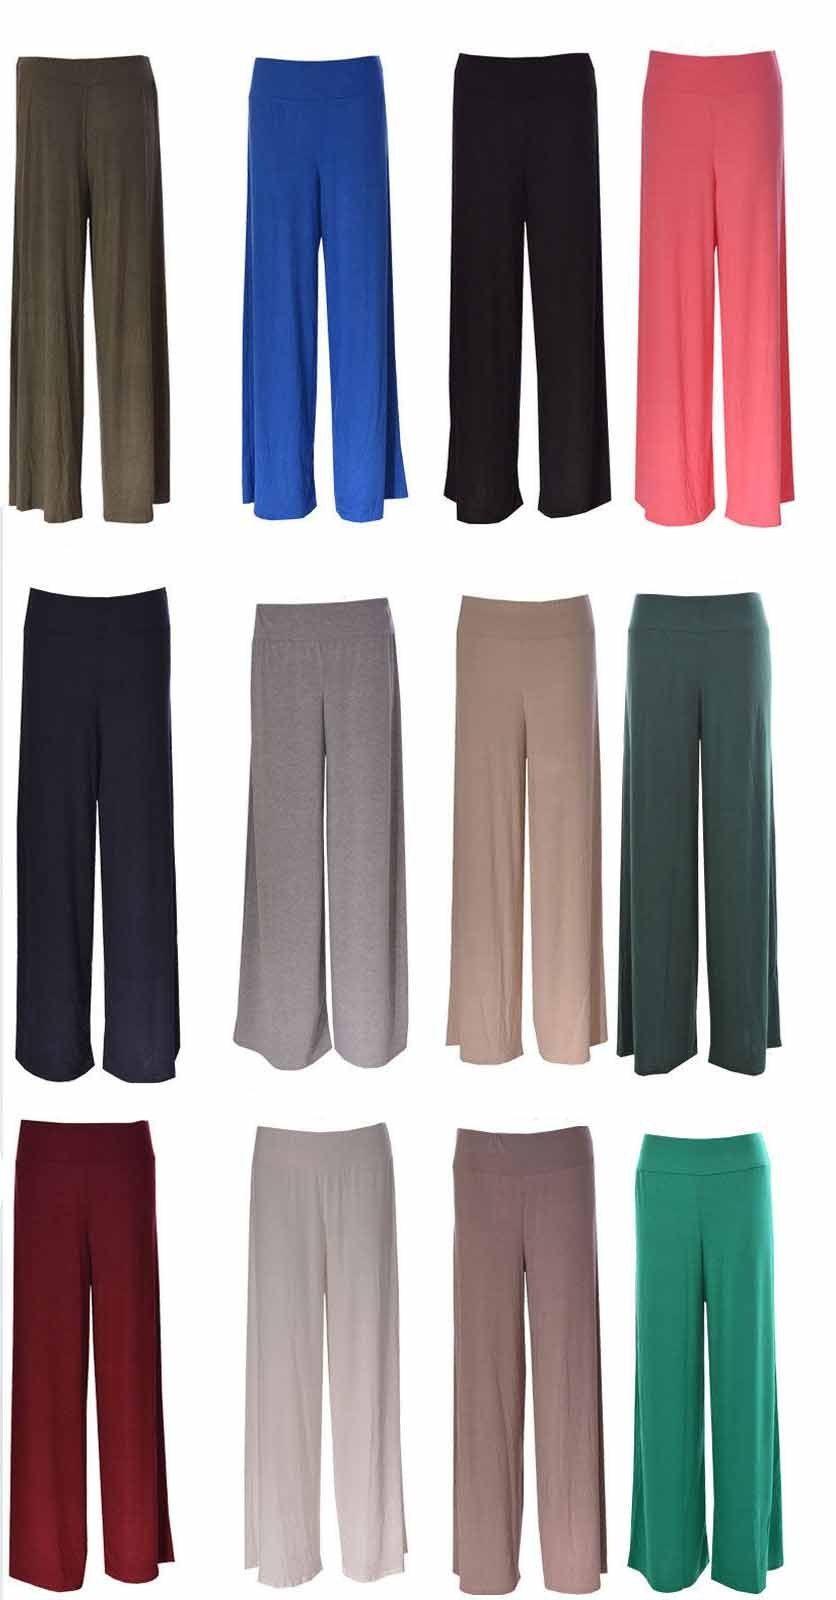 35c335999fa84 New Women Ladies Palazzo Plain Flared Wide Leg Pants leggings Baggy Trousers